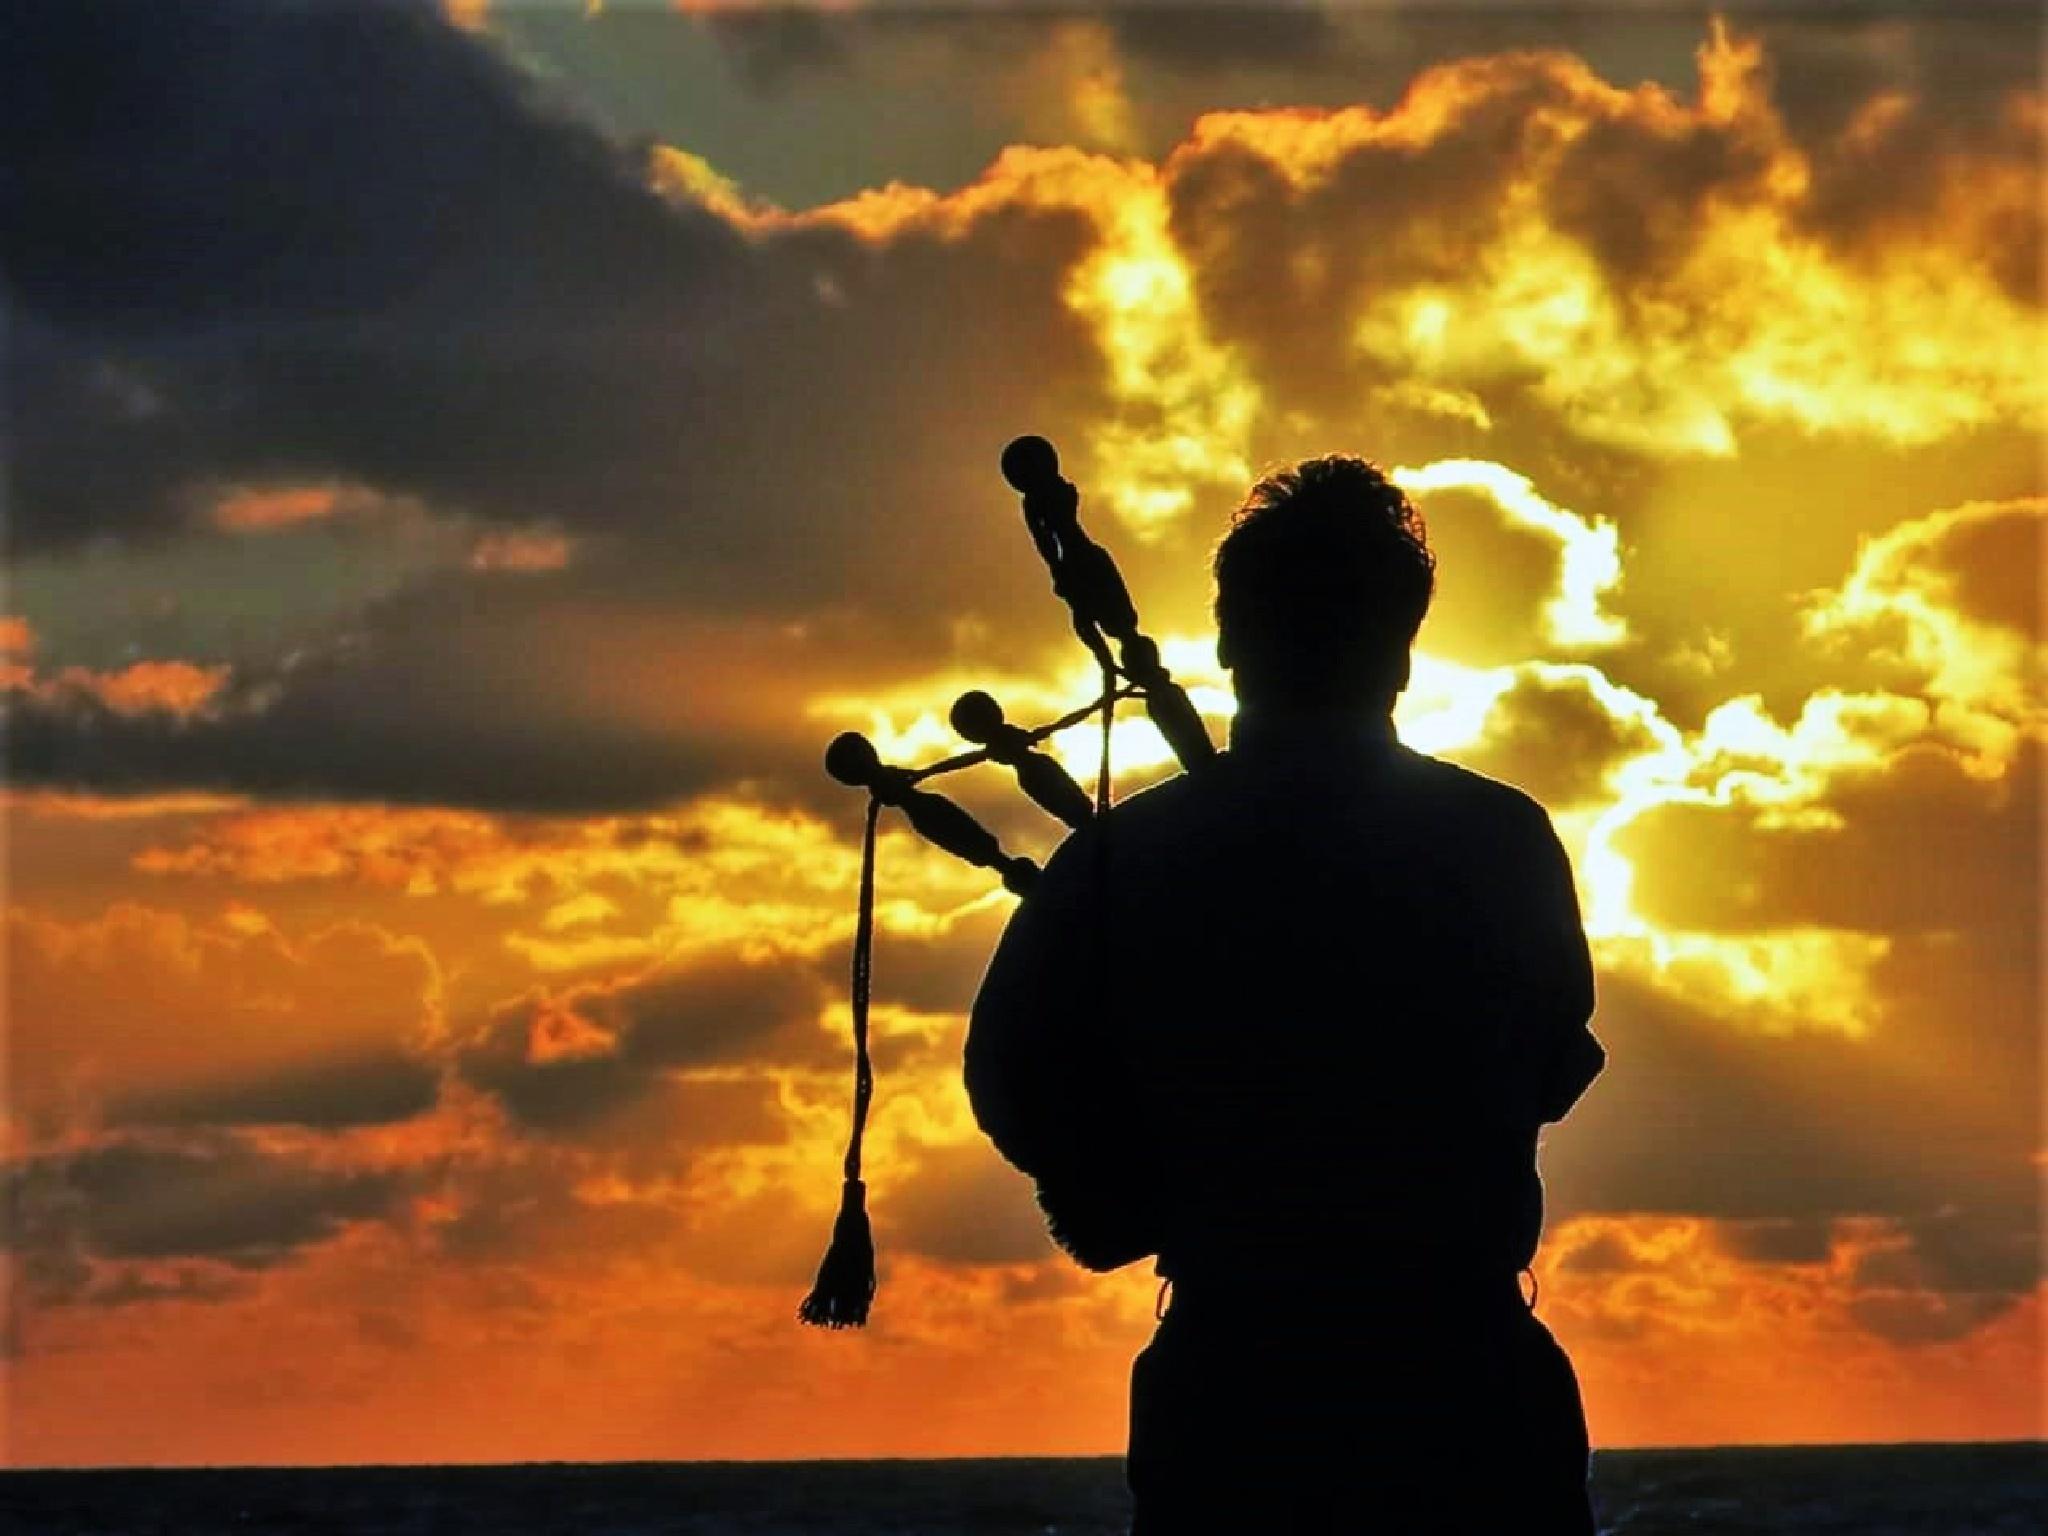 Bagpipes at sunrise by peterjohn